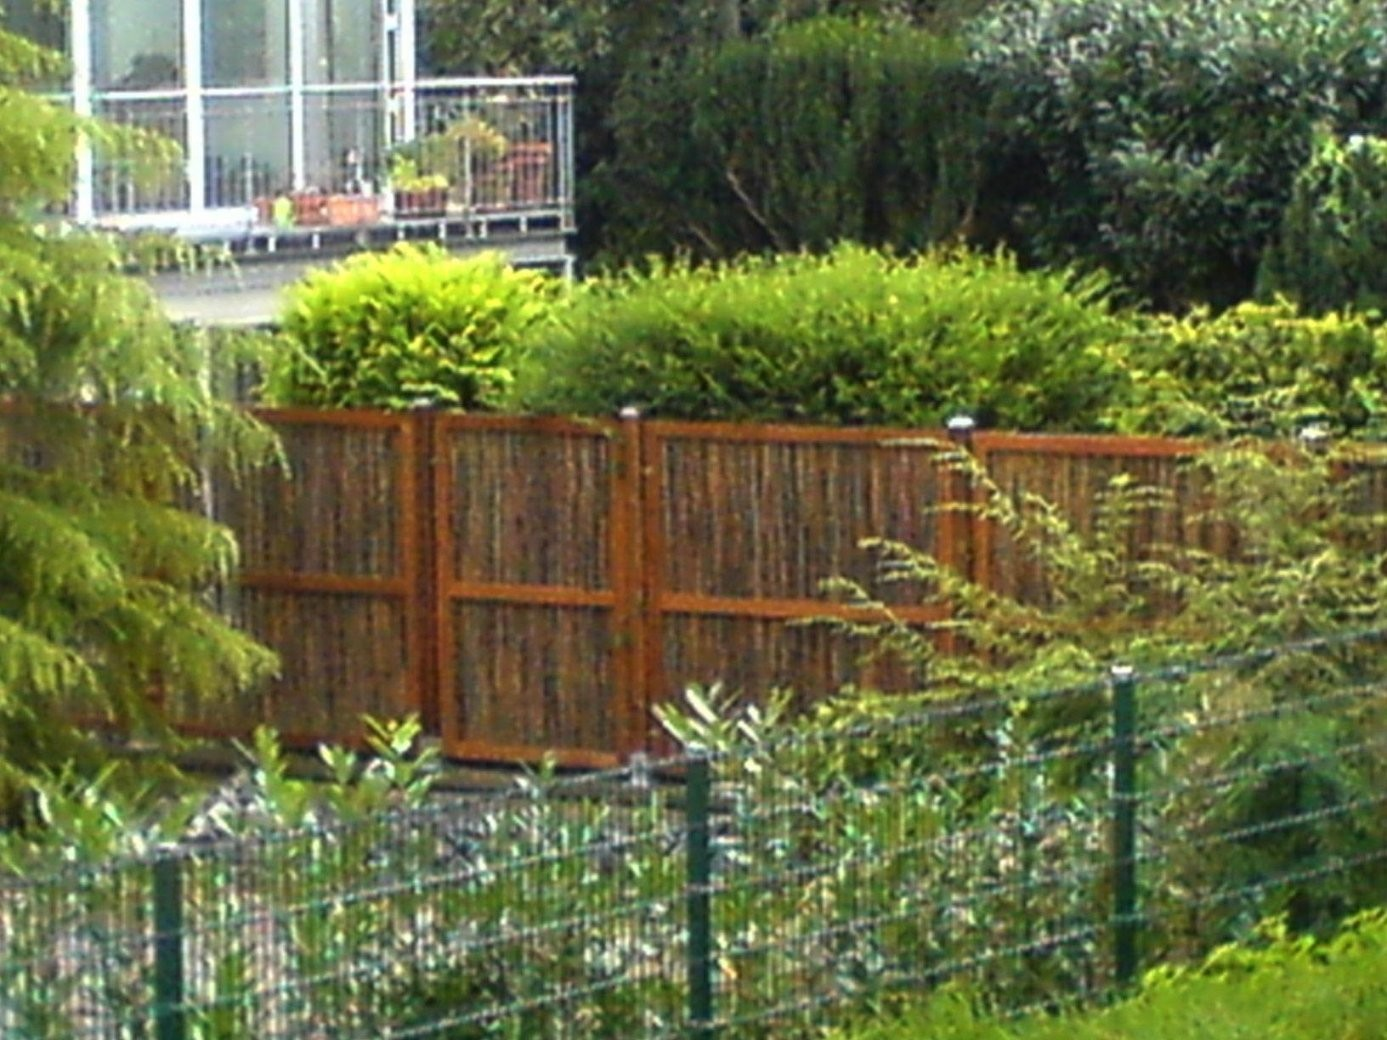 Garten Sichtschutz Selber Bauen Neu Sichtschutz Garten Weide Von von Sichtschutz Weide Selber Bauen Photo